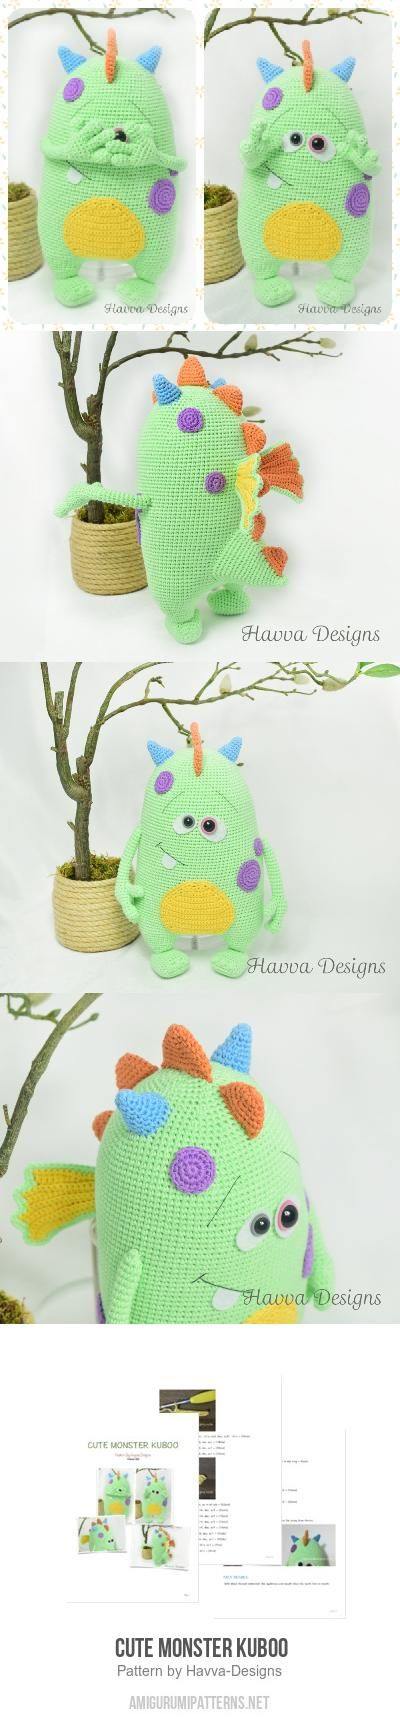 Cute Monster Kuboo Amigurumi Pattern Paid pattern